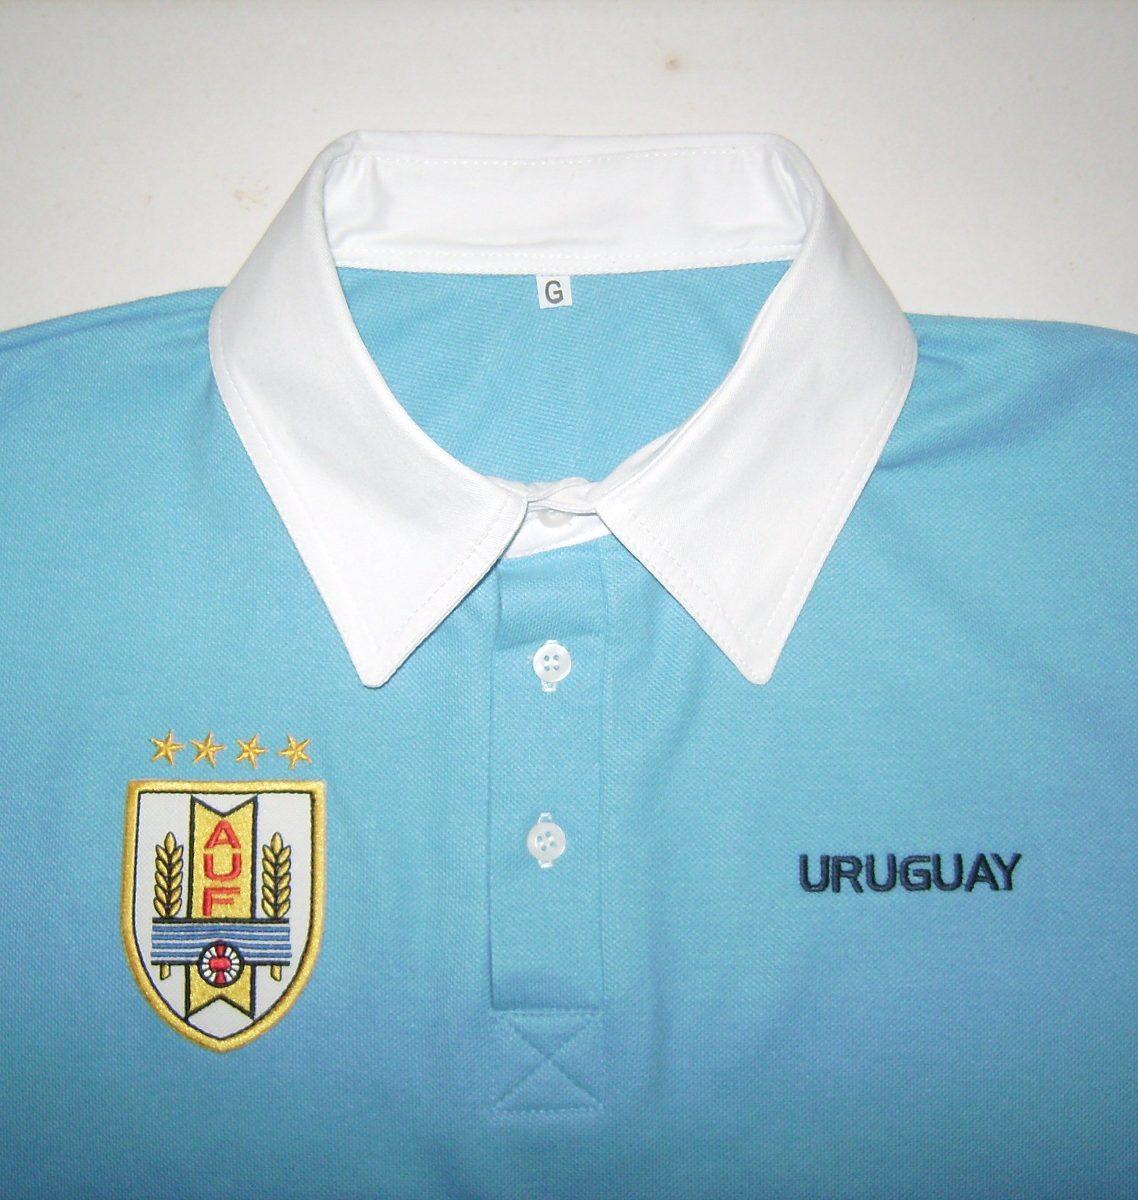 d3a8f94a2dcc5 camisa polo uruguay escrito grande. Carregando zoom.